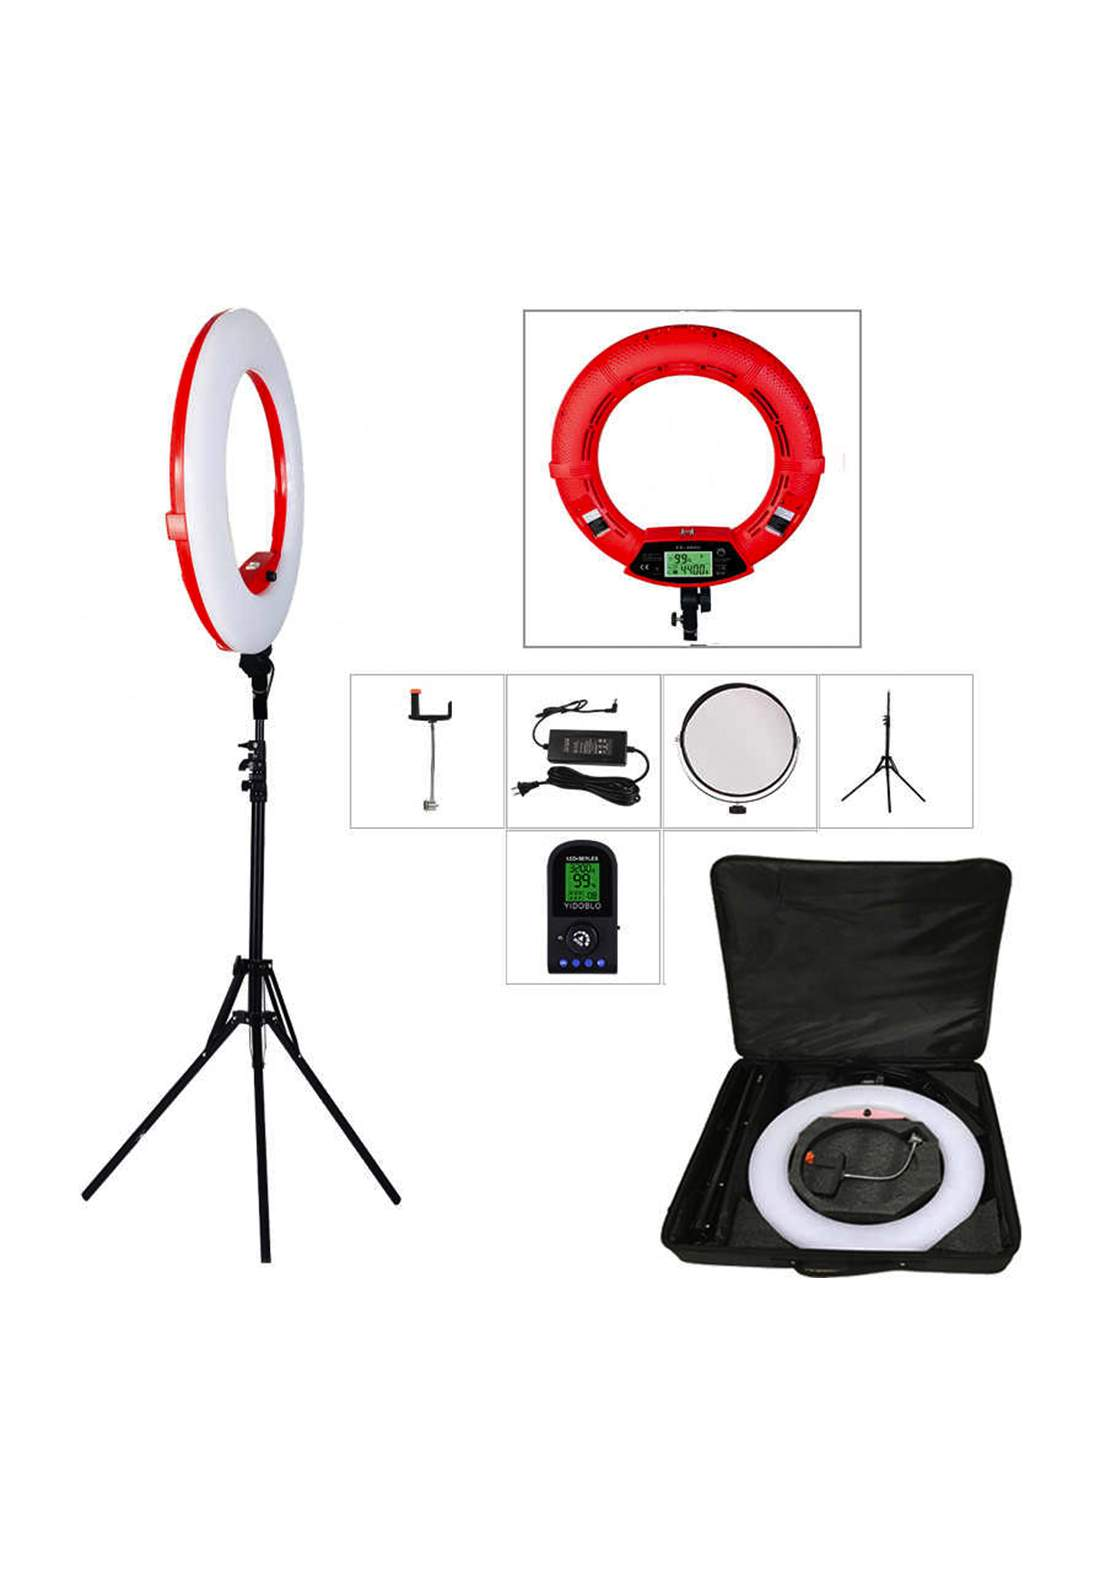 Yidoblo FC-480 Studio LED Ring Light حلقة التصوير المضيئة